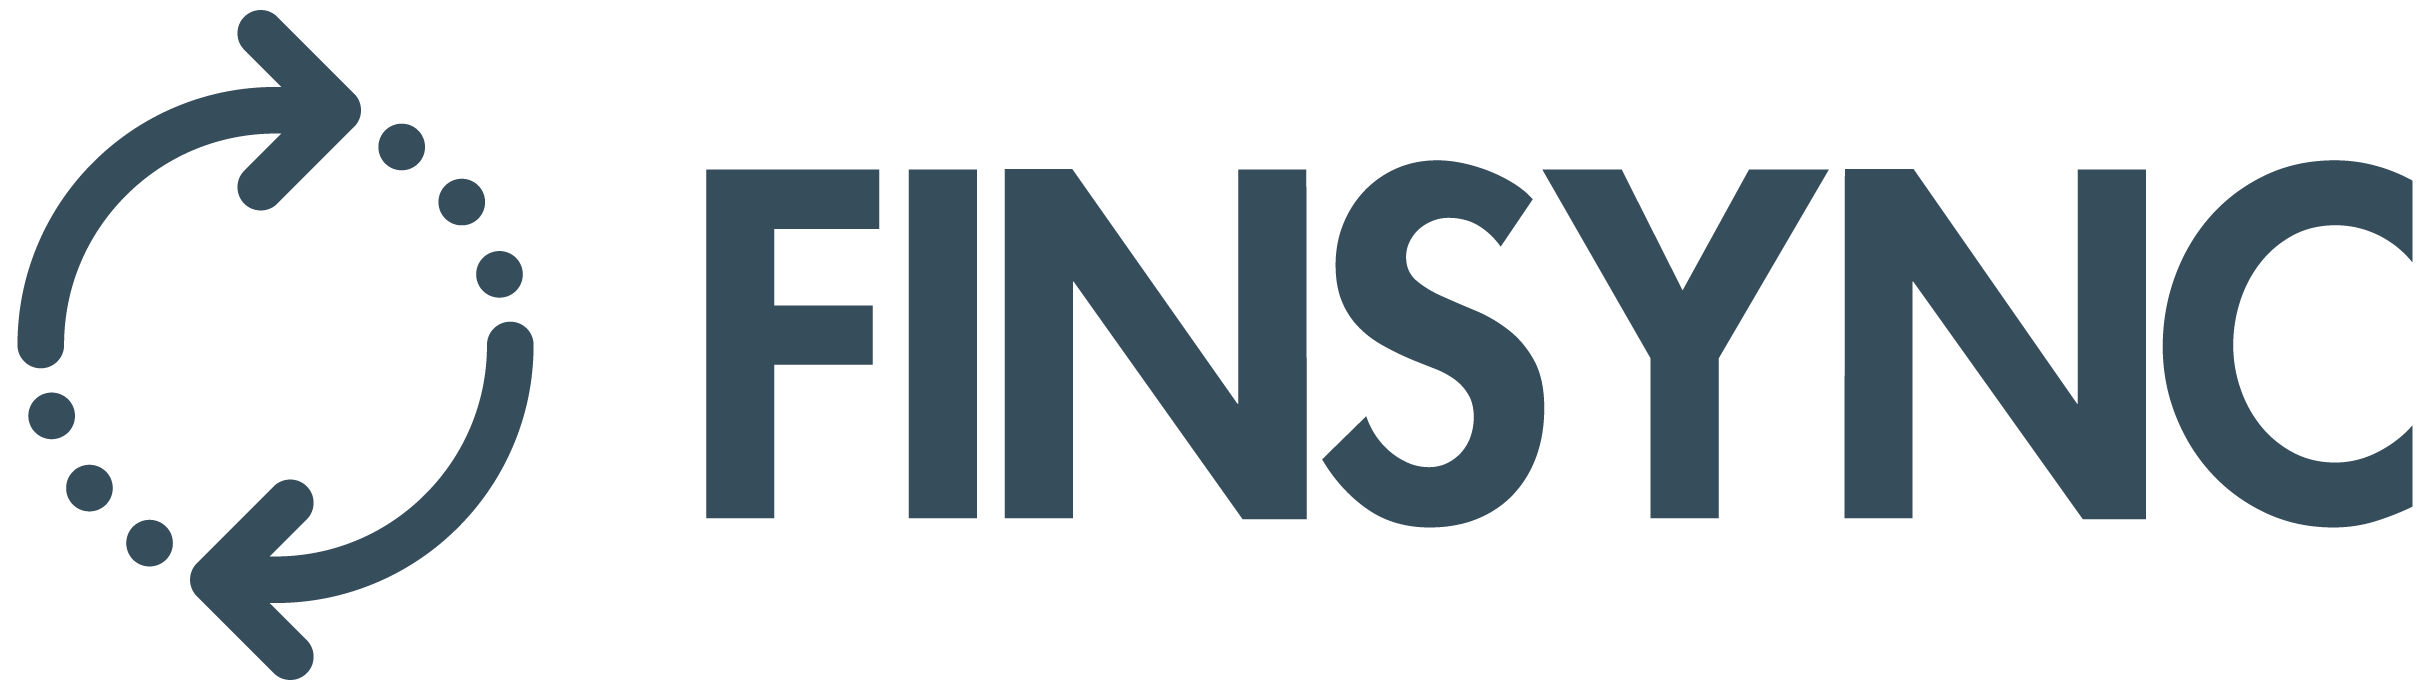 FINSYNC-Emblem-Topaz-Dark@3x